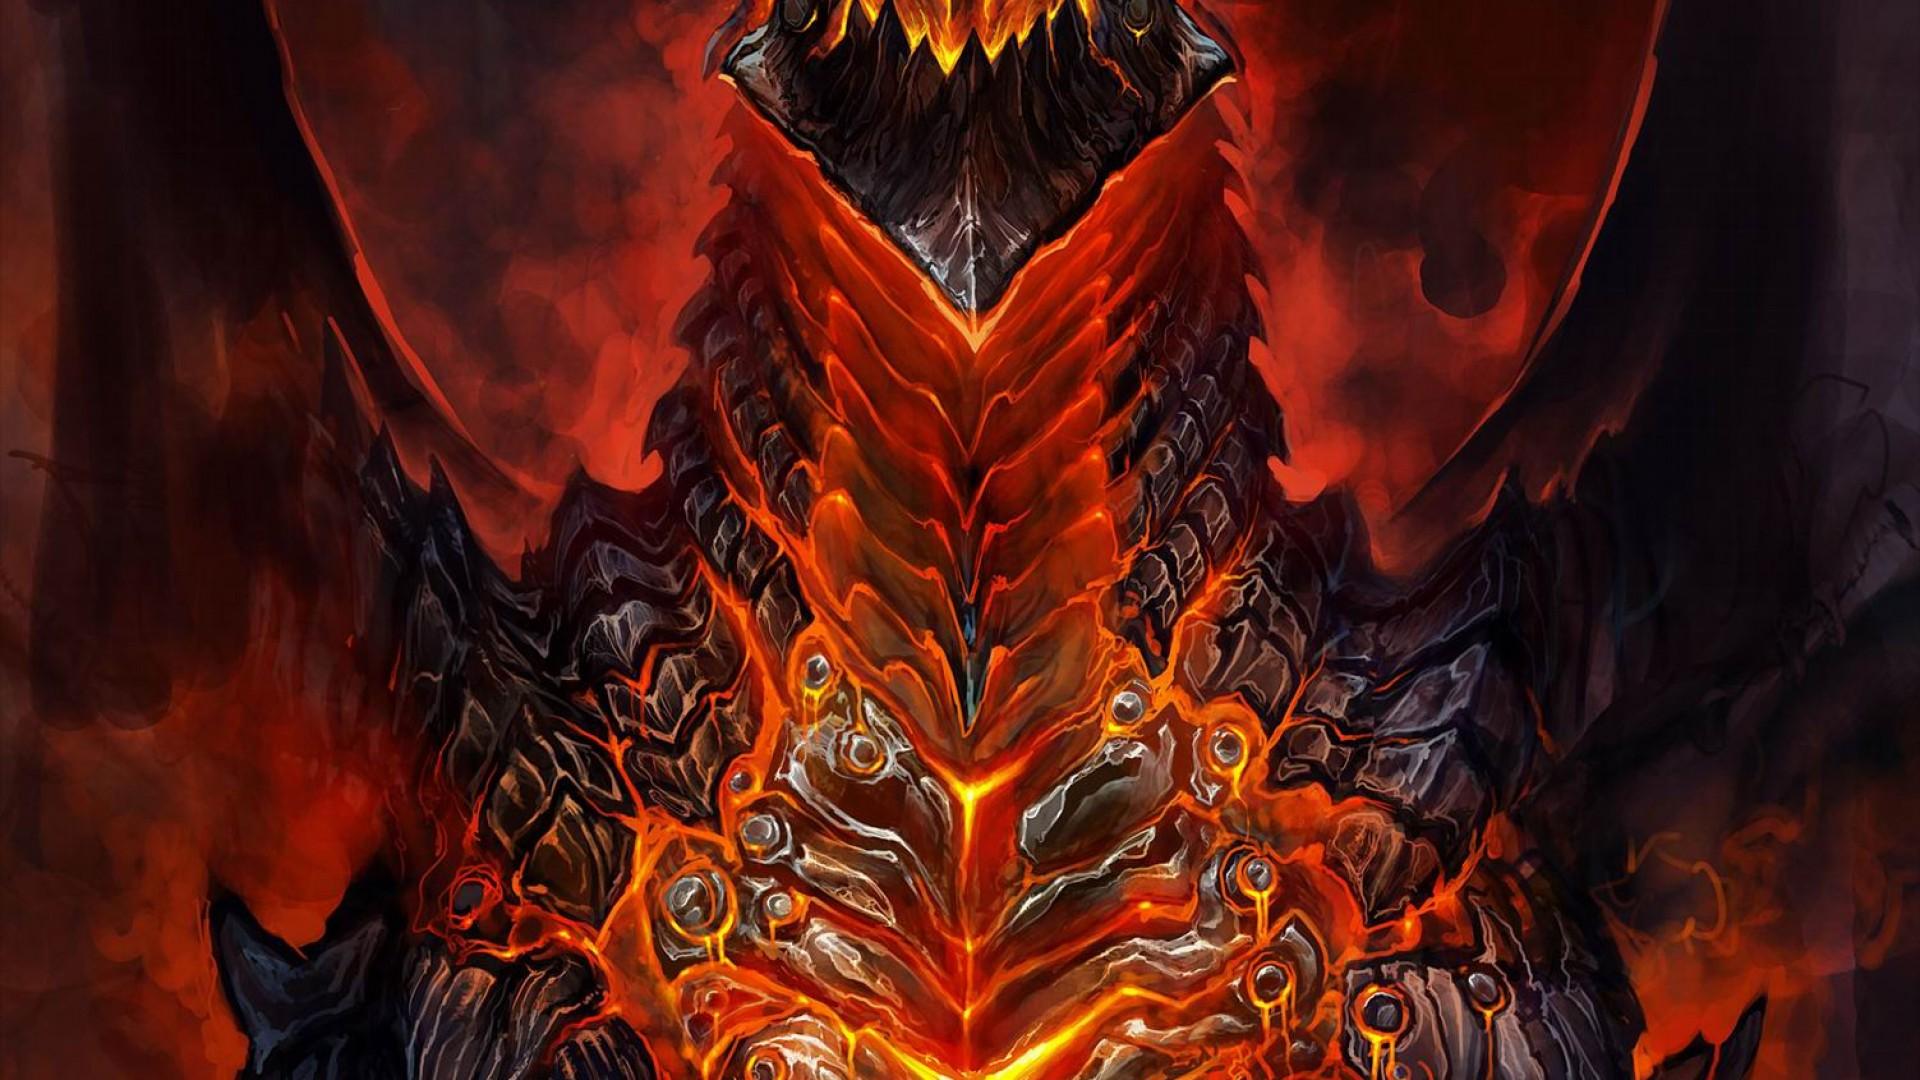 Deathwing Wallpaper - WallpaperSafari  World Of Warcraft Cataclysm Wallpapers